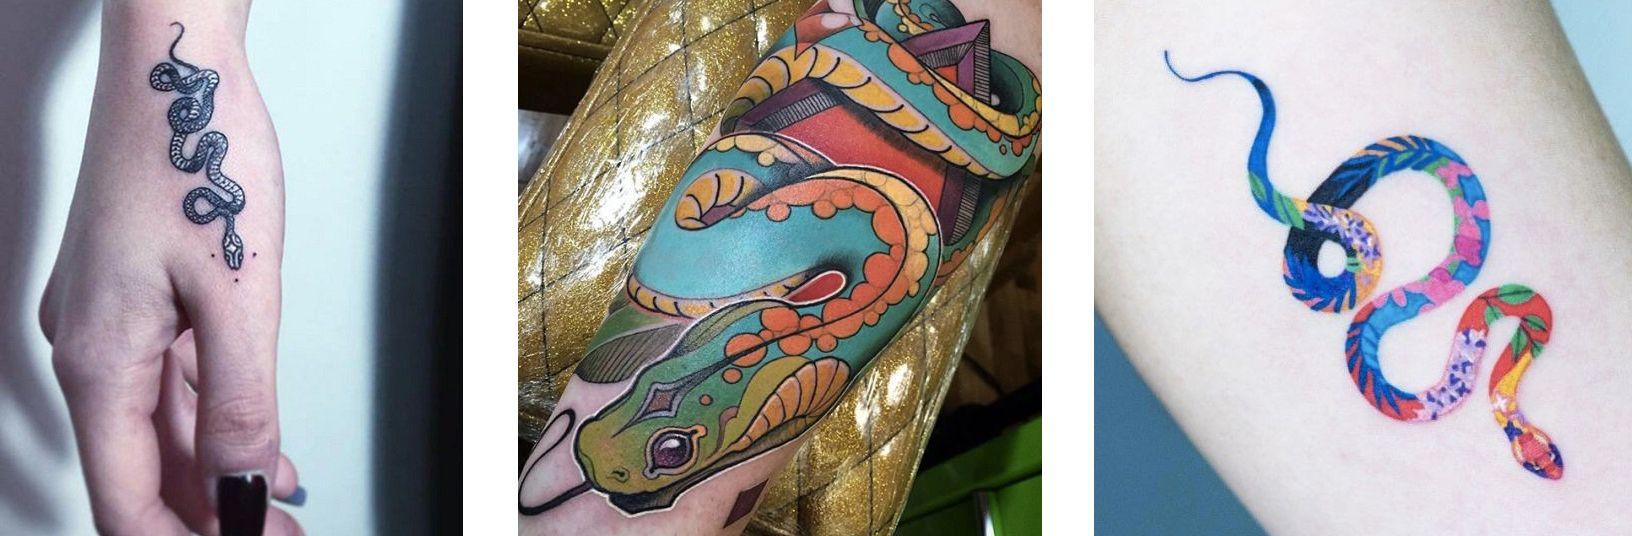 Tatuaggio Tattoo Serpente Stili